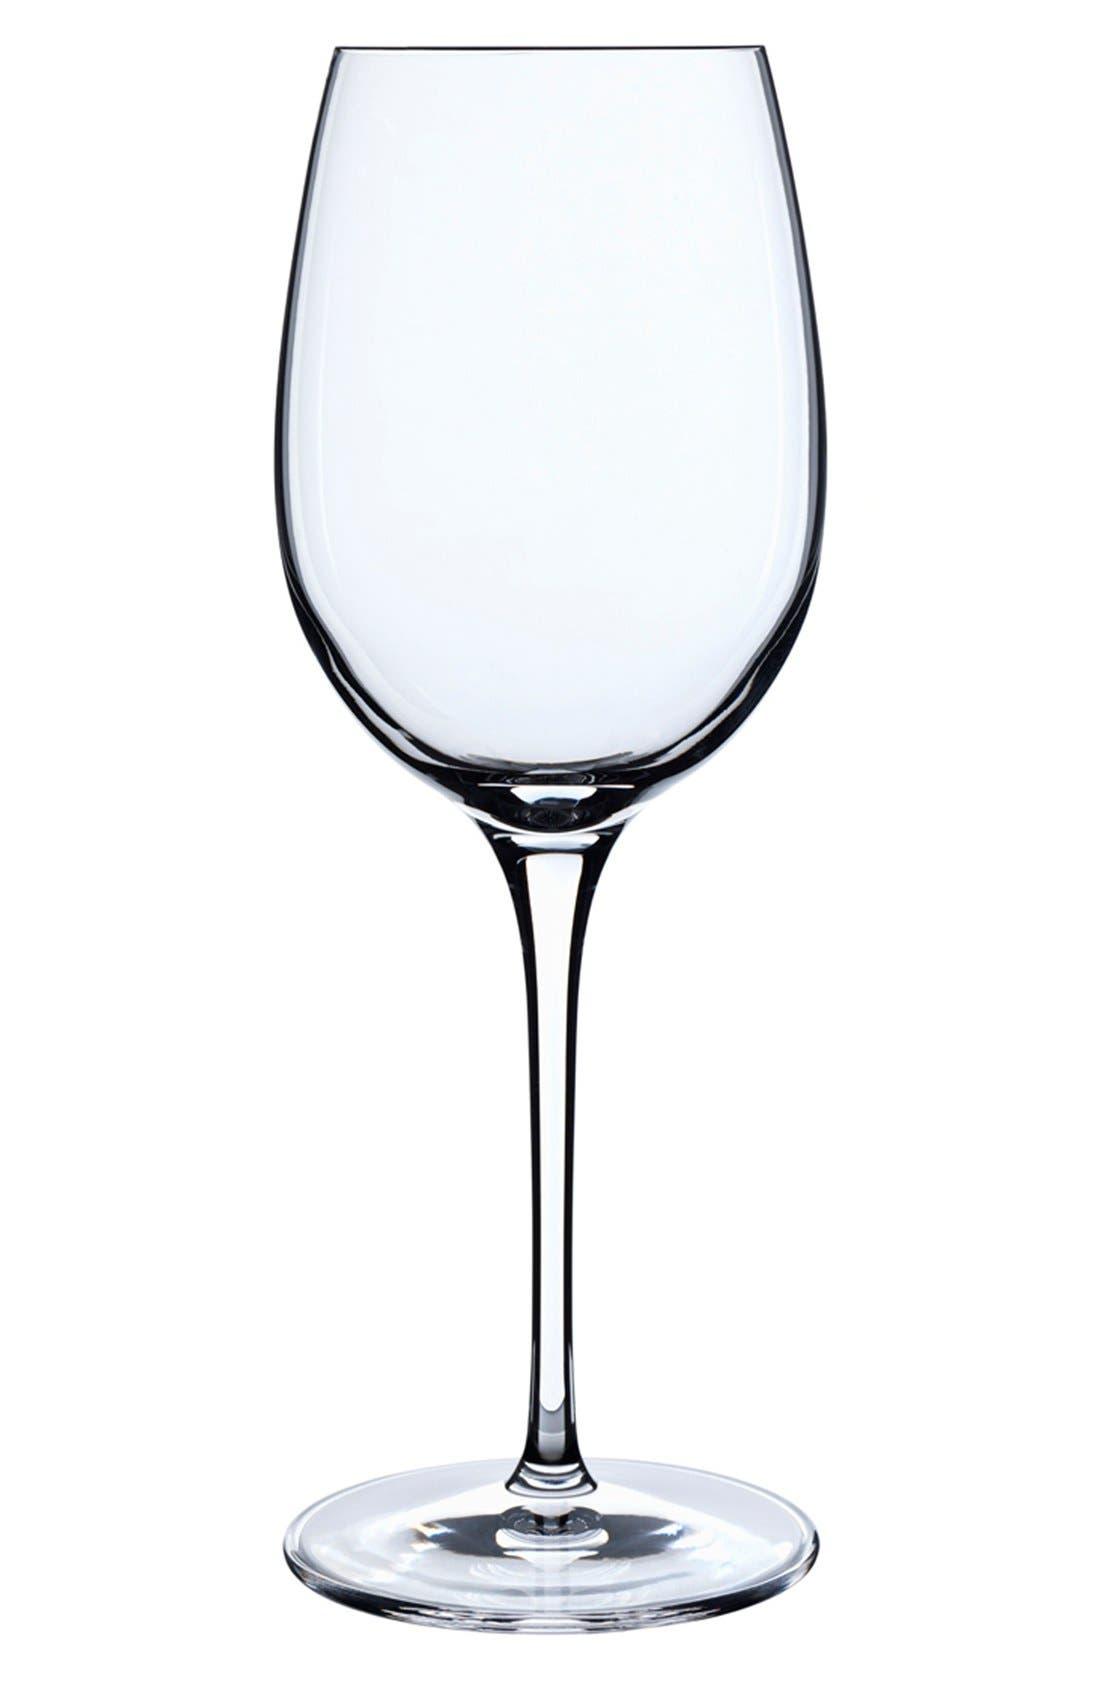 Crescendo Set of 4 Chardonnay Glasses,                             Main thumbnail 1, color,                             Clear